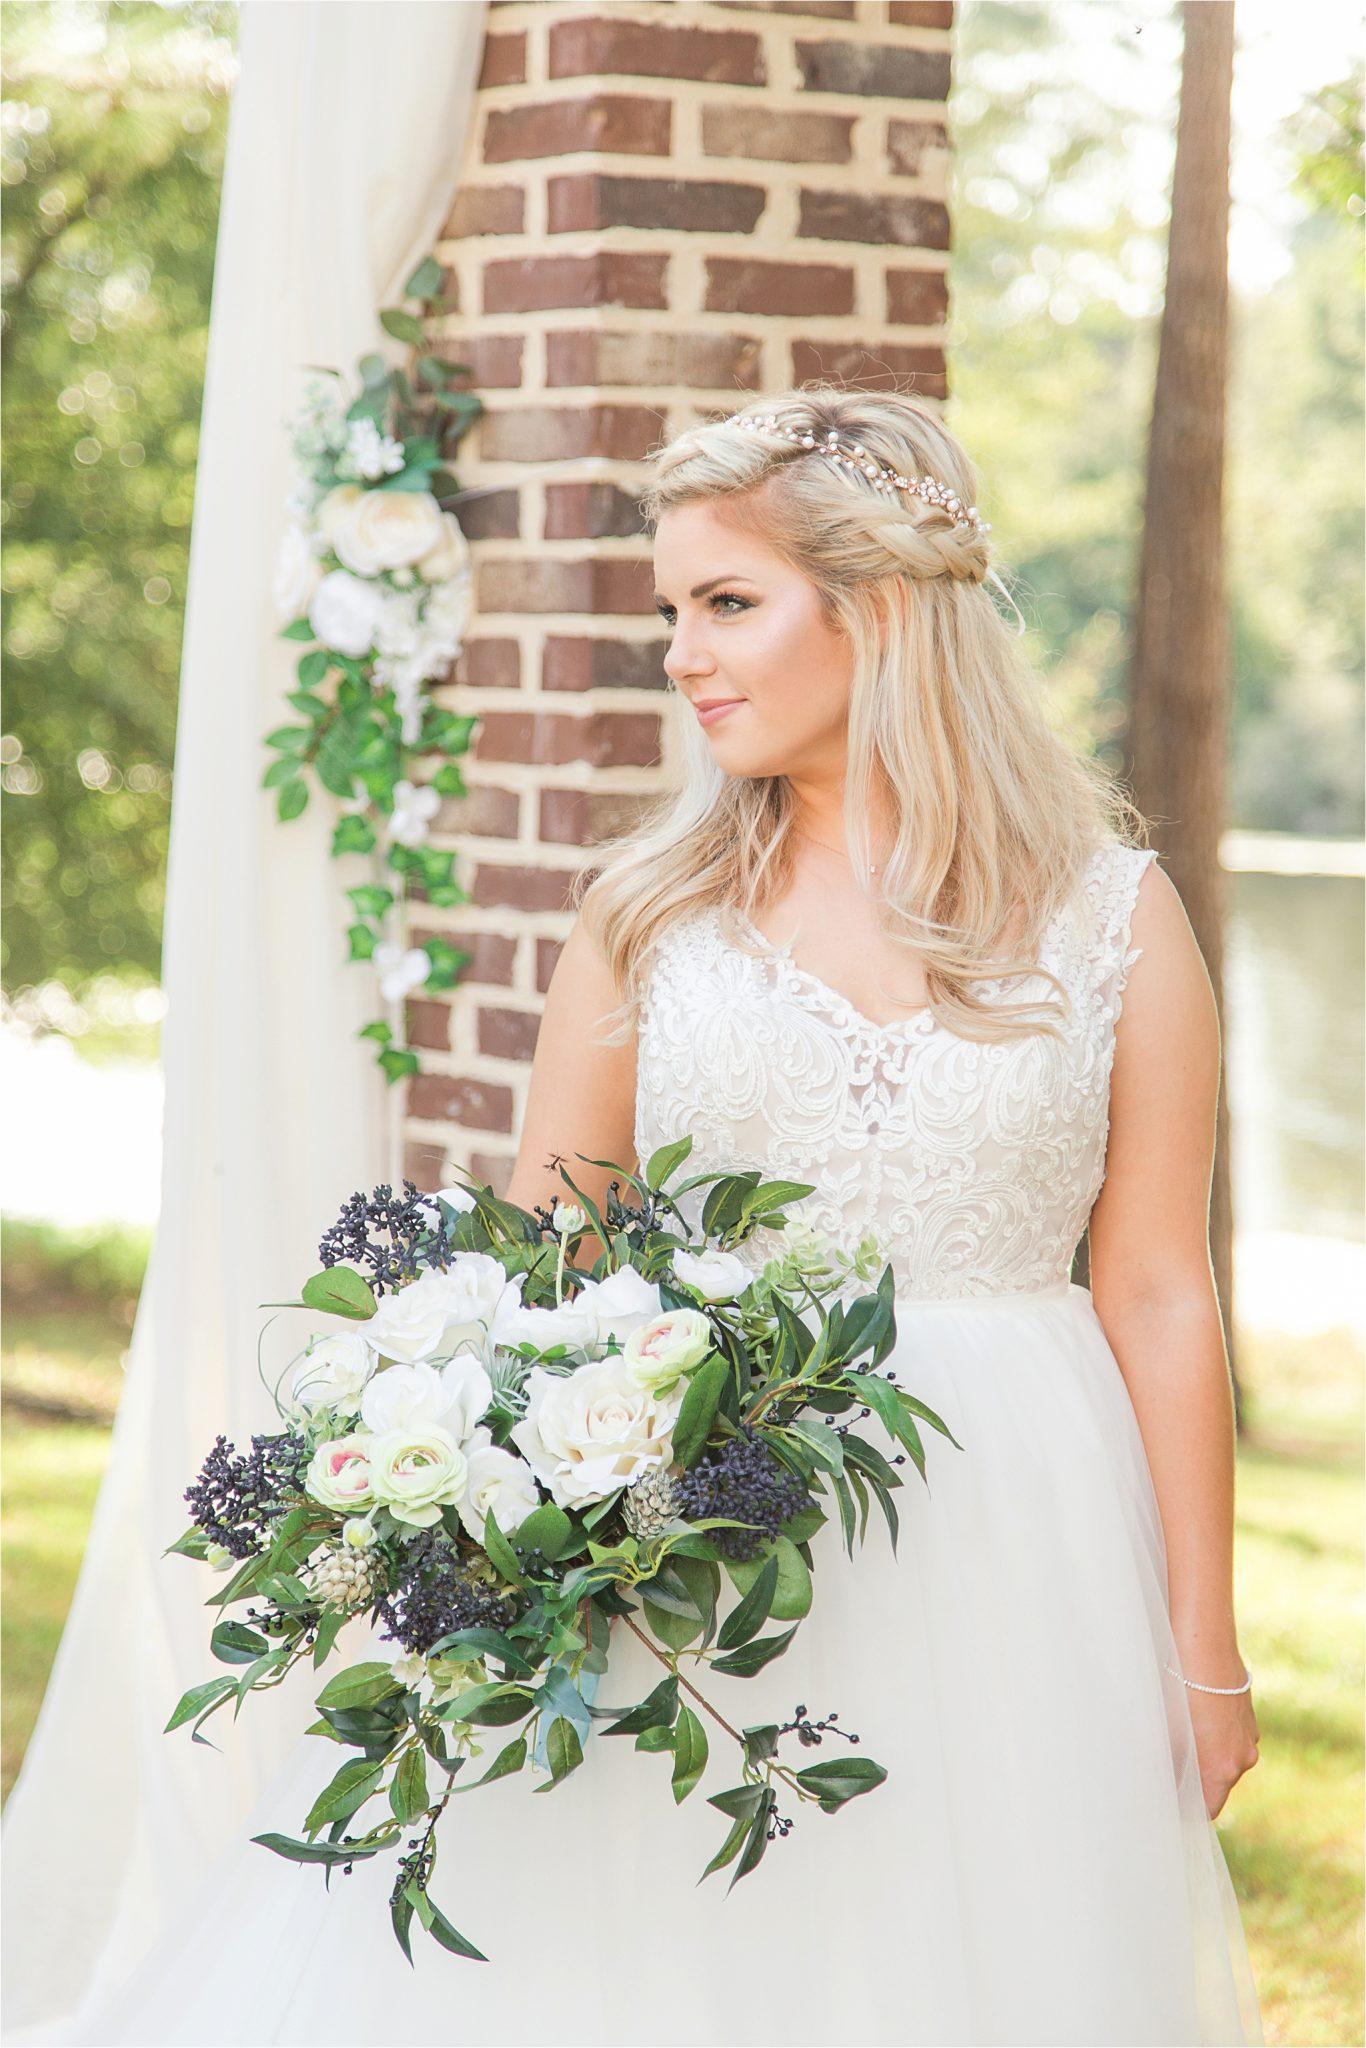 bridal-photos-portraits-pearl-hair-crown-navy-blue-flower-bouqet